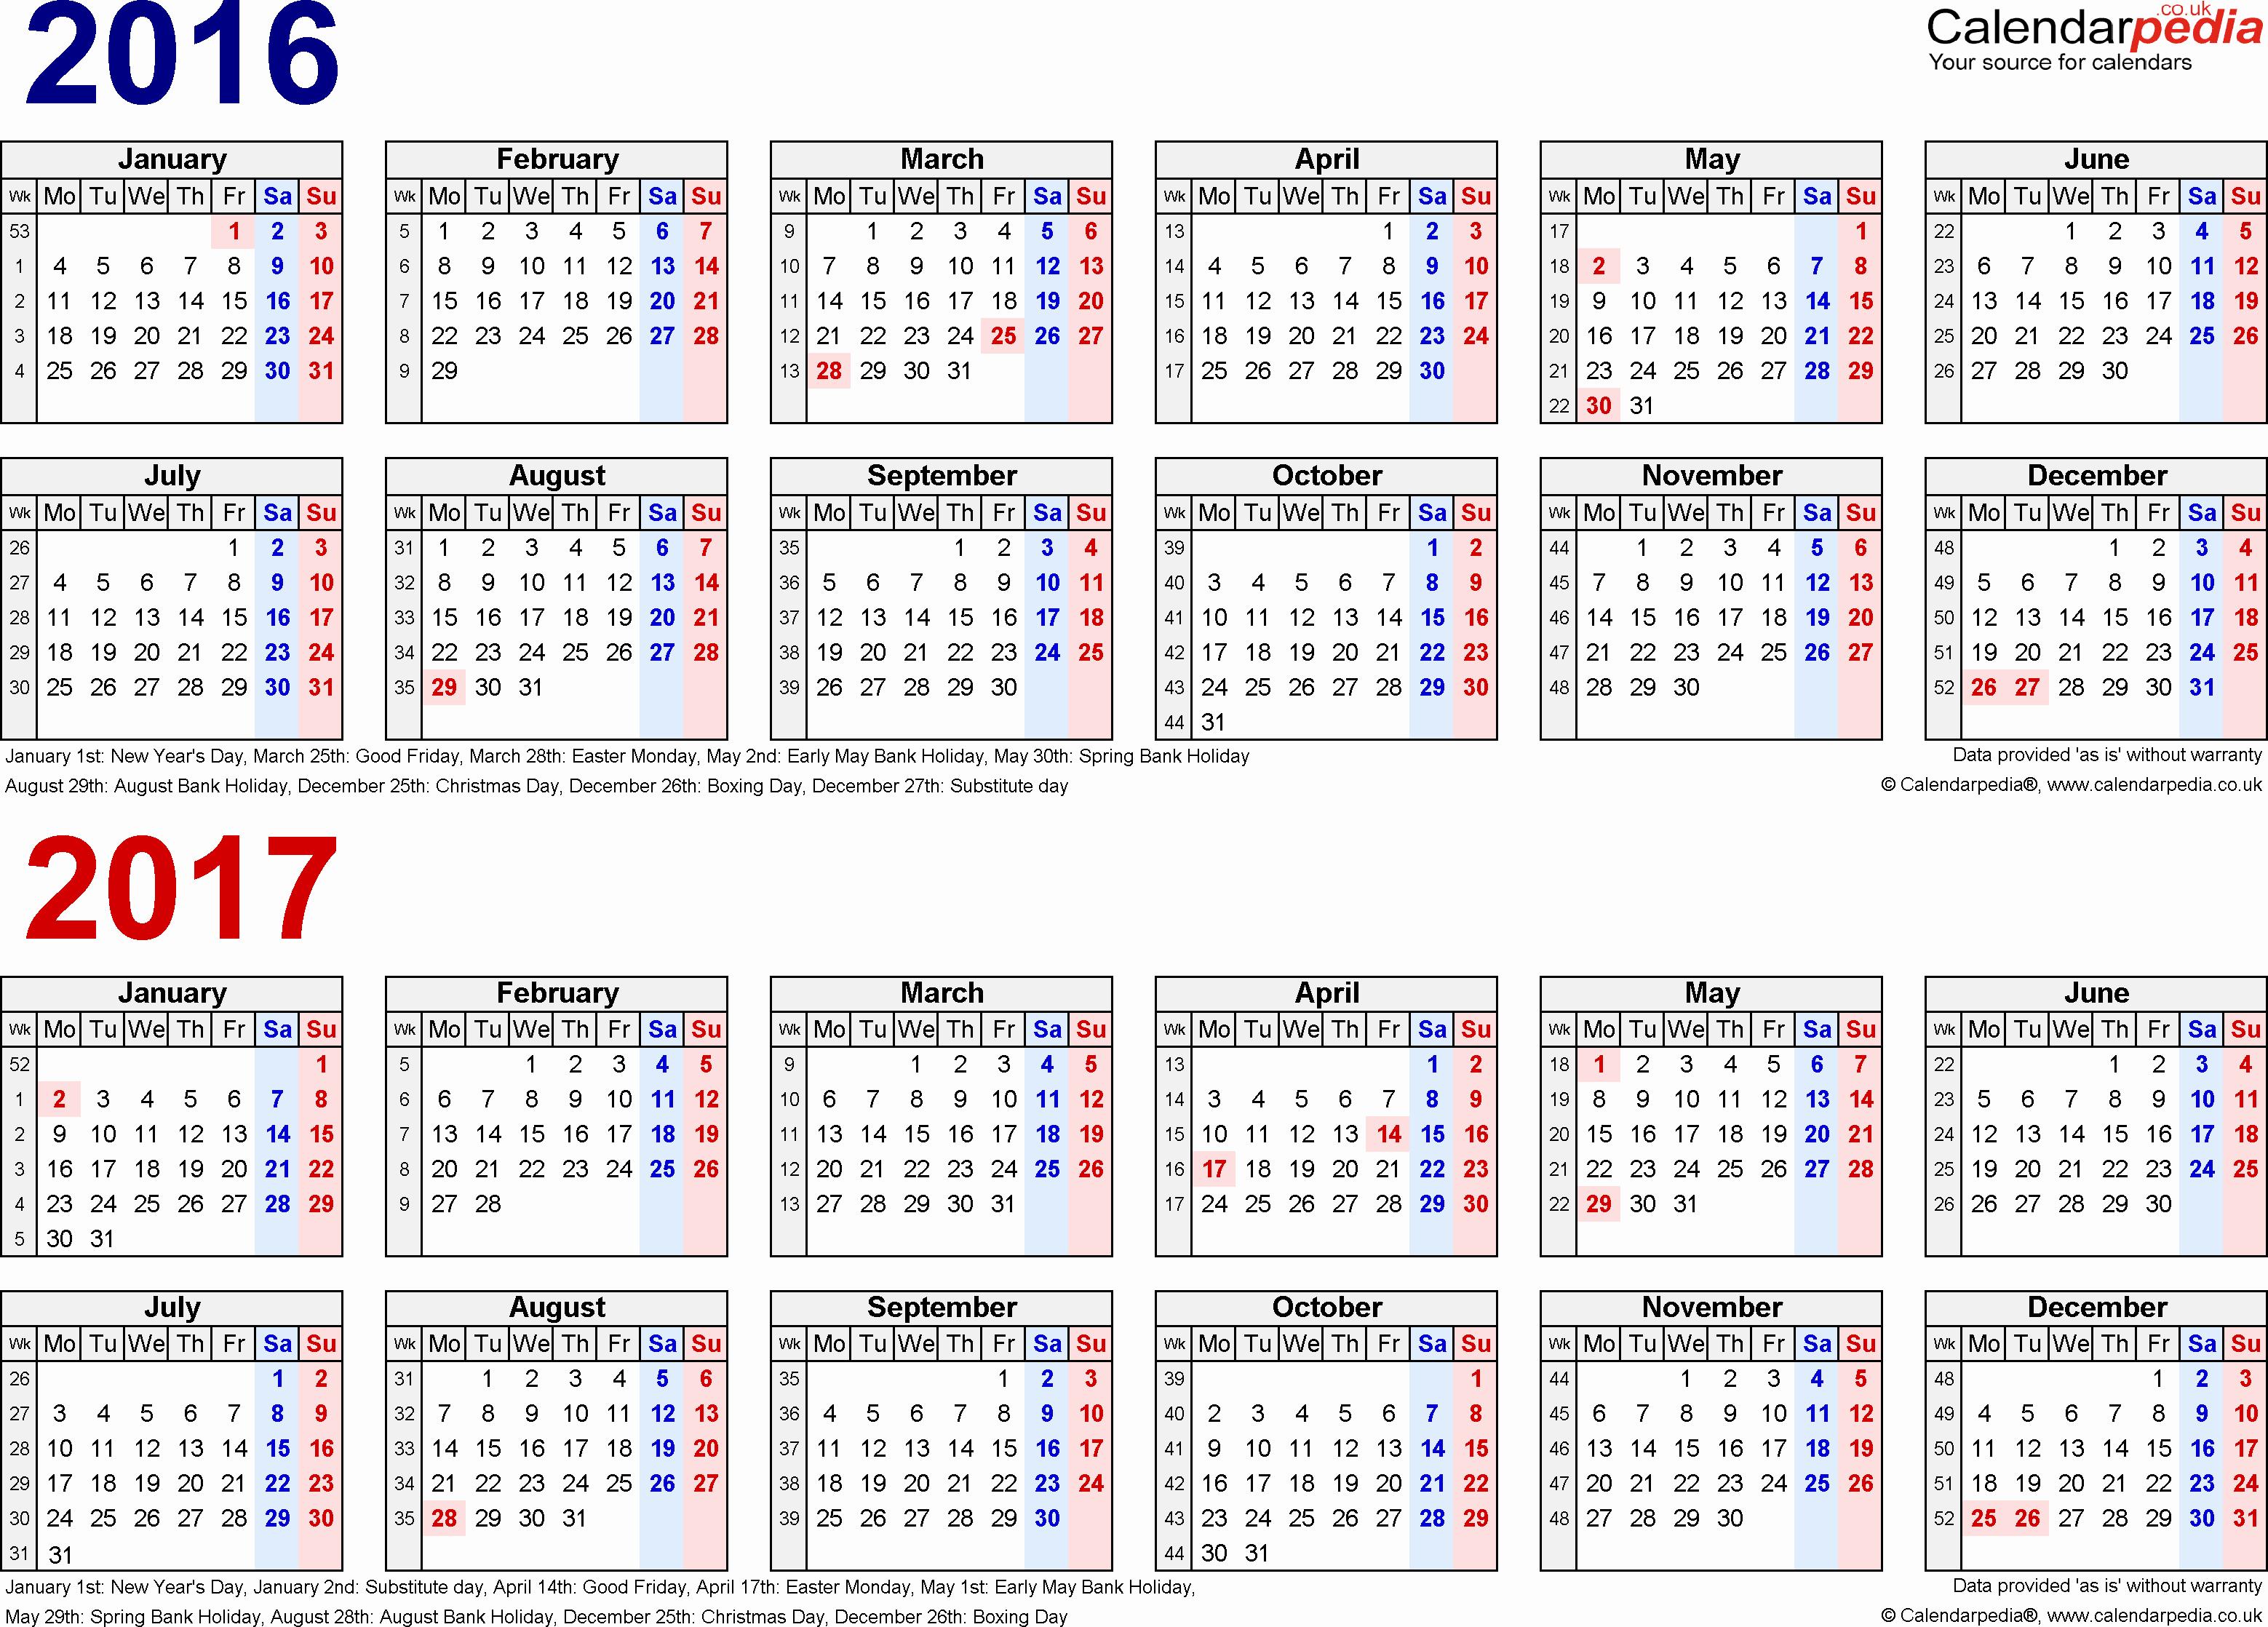 Printable 6 Month Calendar 2016 Best Of 6 Month Planner Calendar 2016 Printable E Page